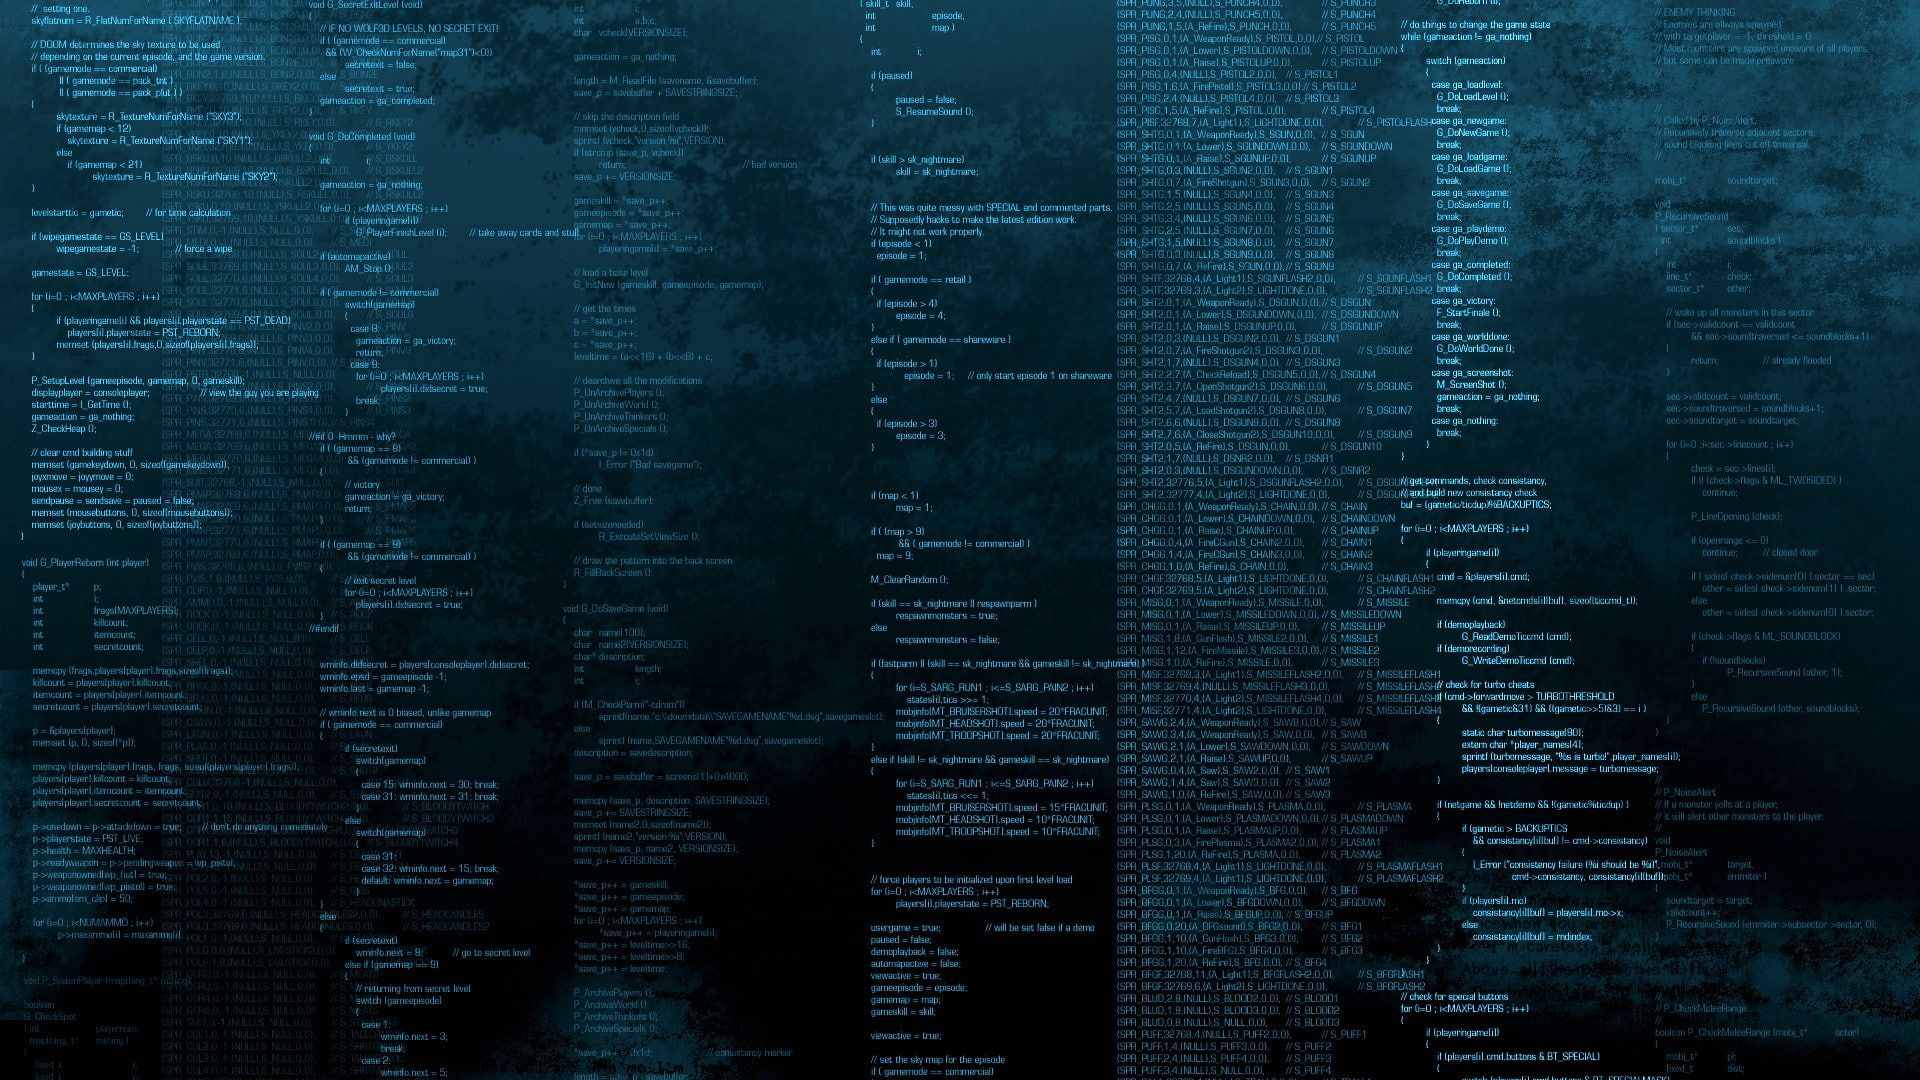 Pin By Emir Becovic On Artificial Intelligence In 2020 Computer Wallpaper Desktop Wallpapers Computer Wallpaper Hi Tech Wallpaper